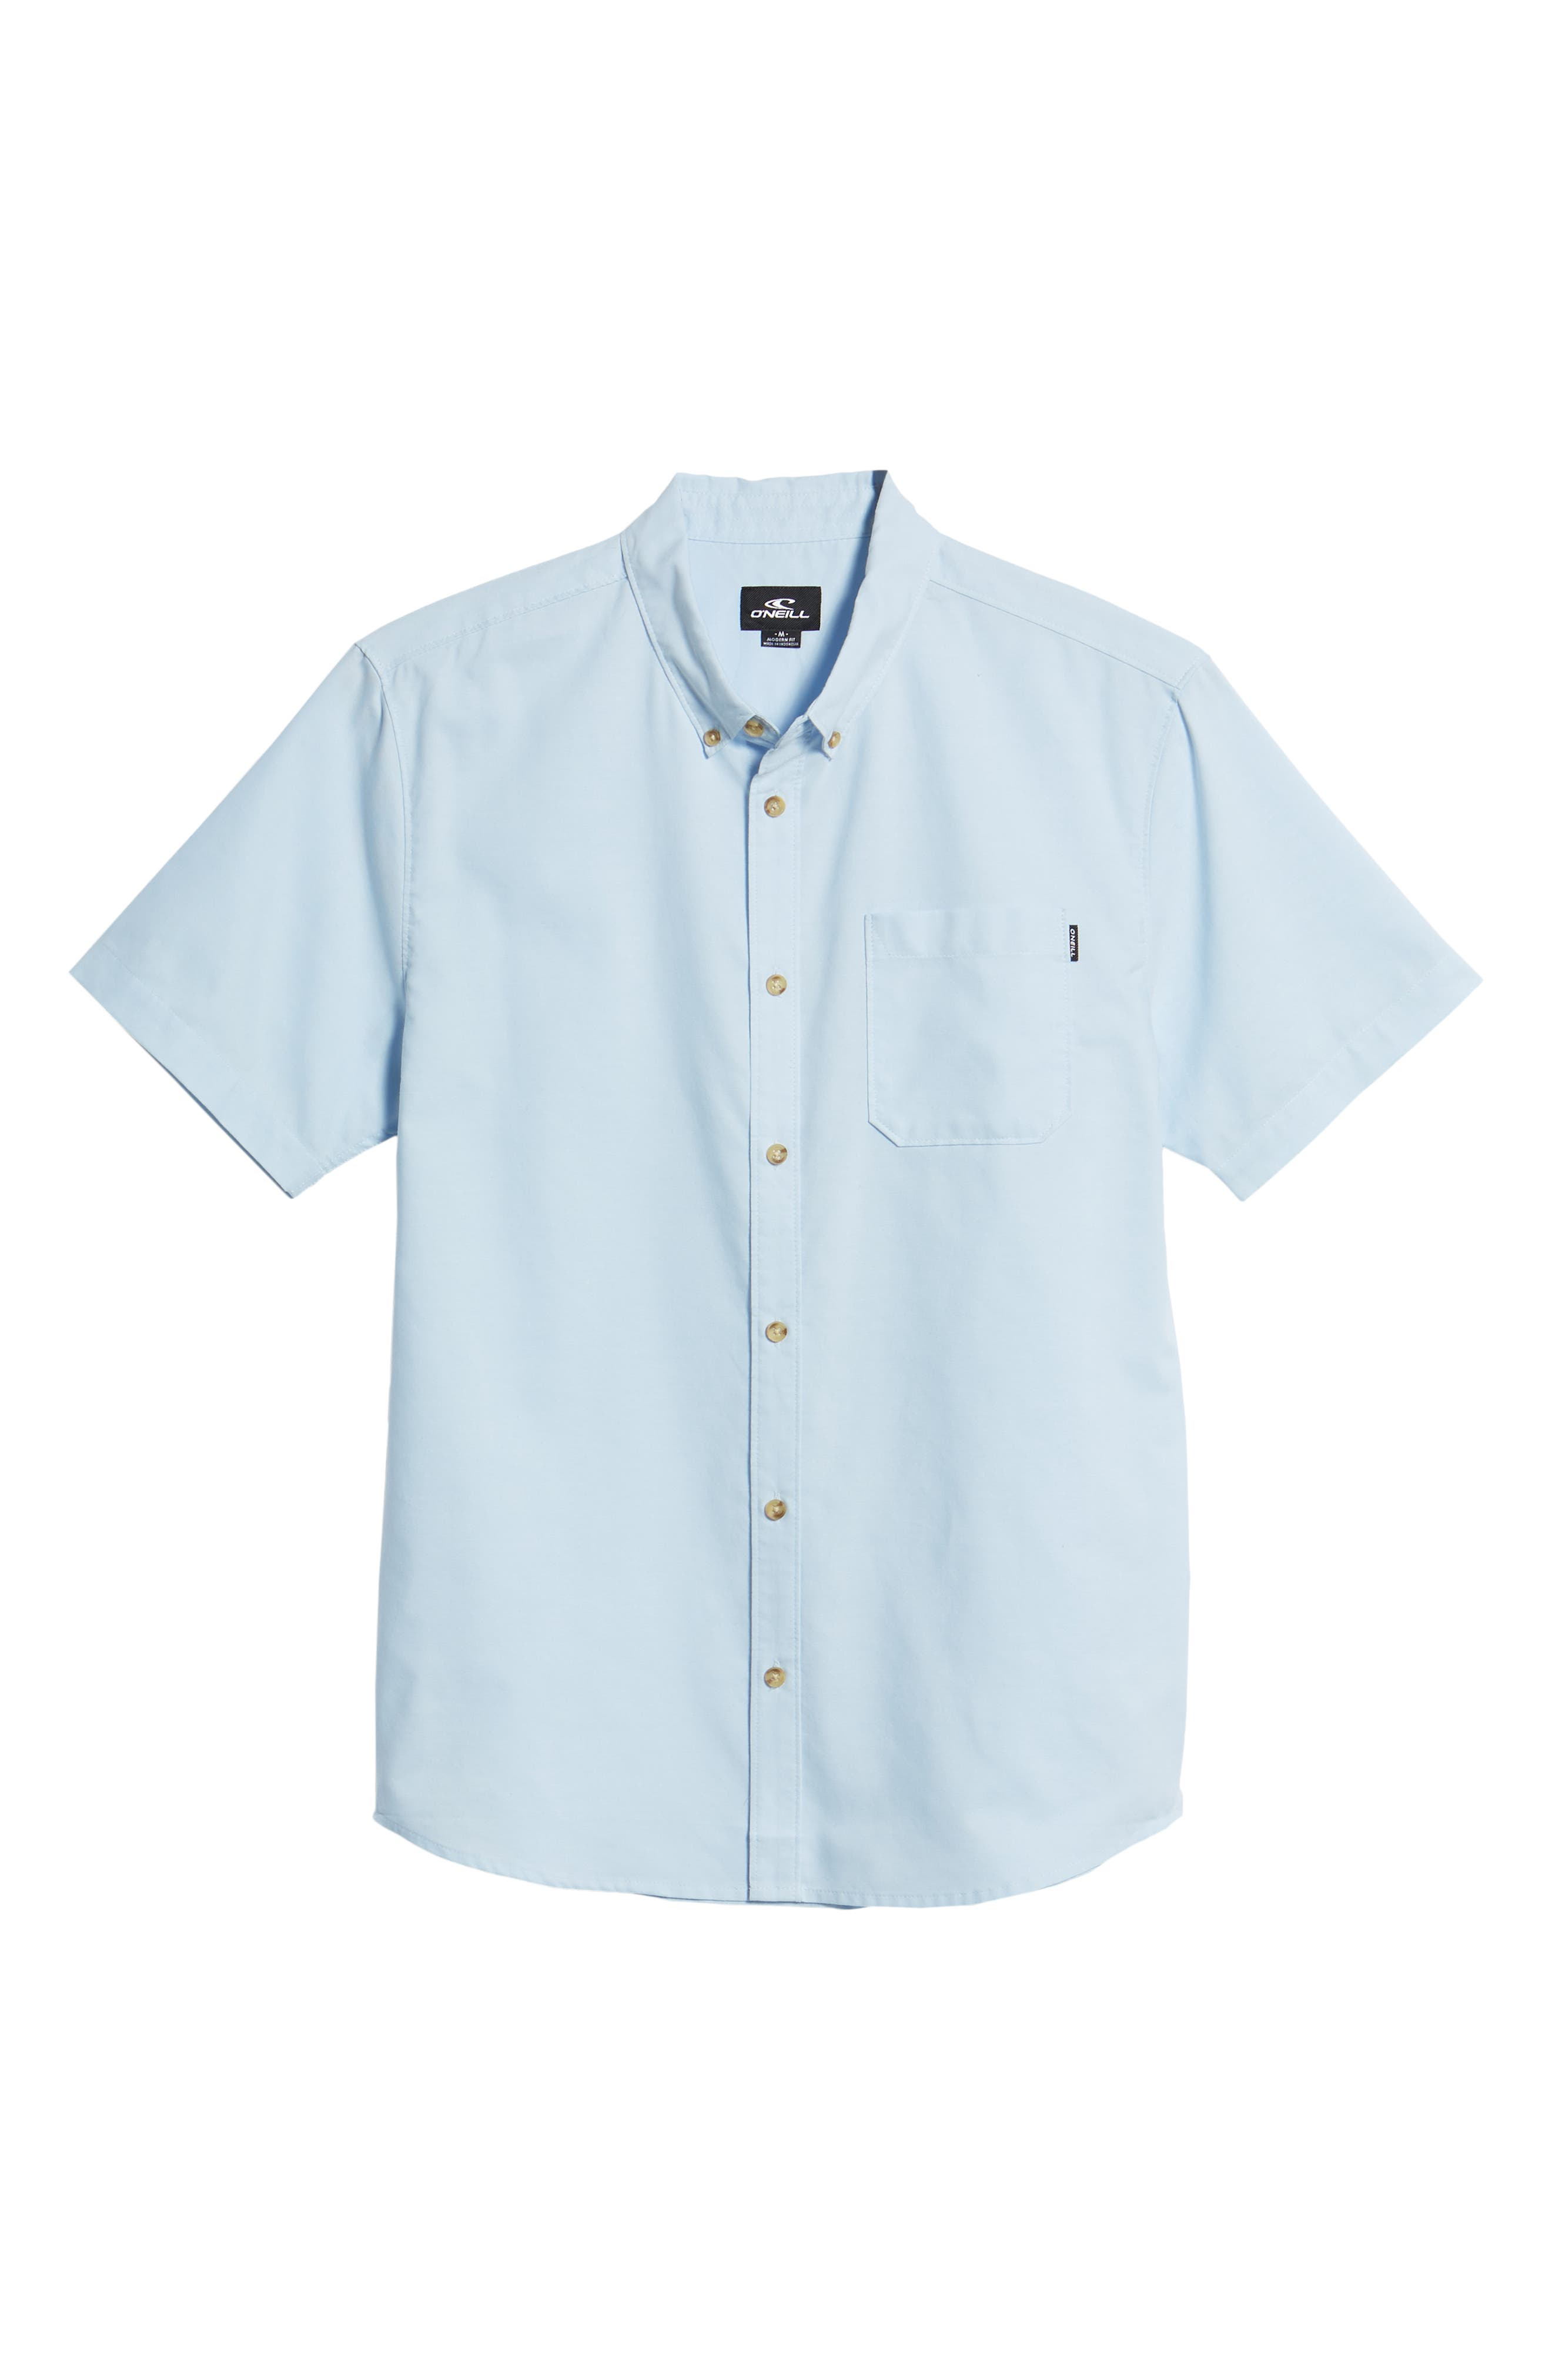 Banks Woven Shirt,                             Alternate thumbnail 6, color,                             Light Blue